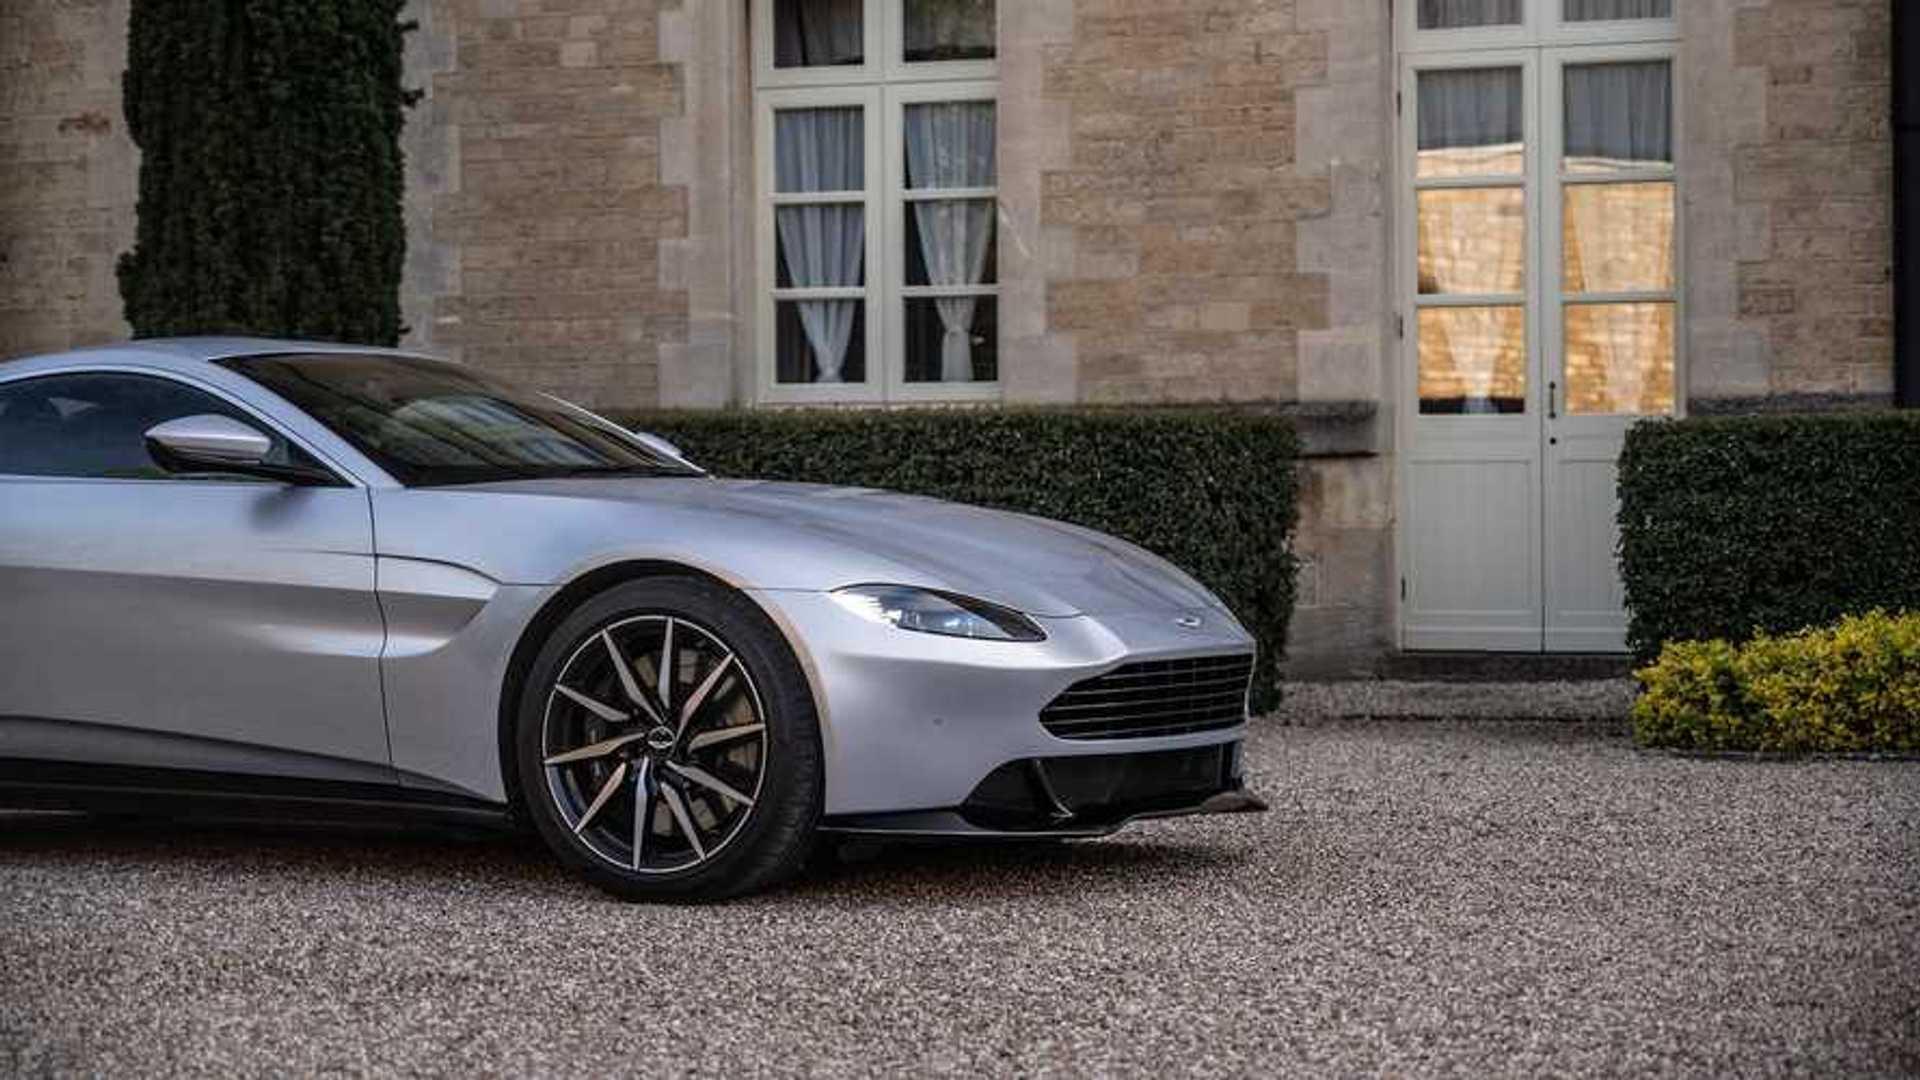 Aston Martin Vantage Gets A Nose Job From Revenant Automotive